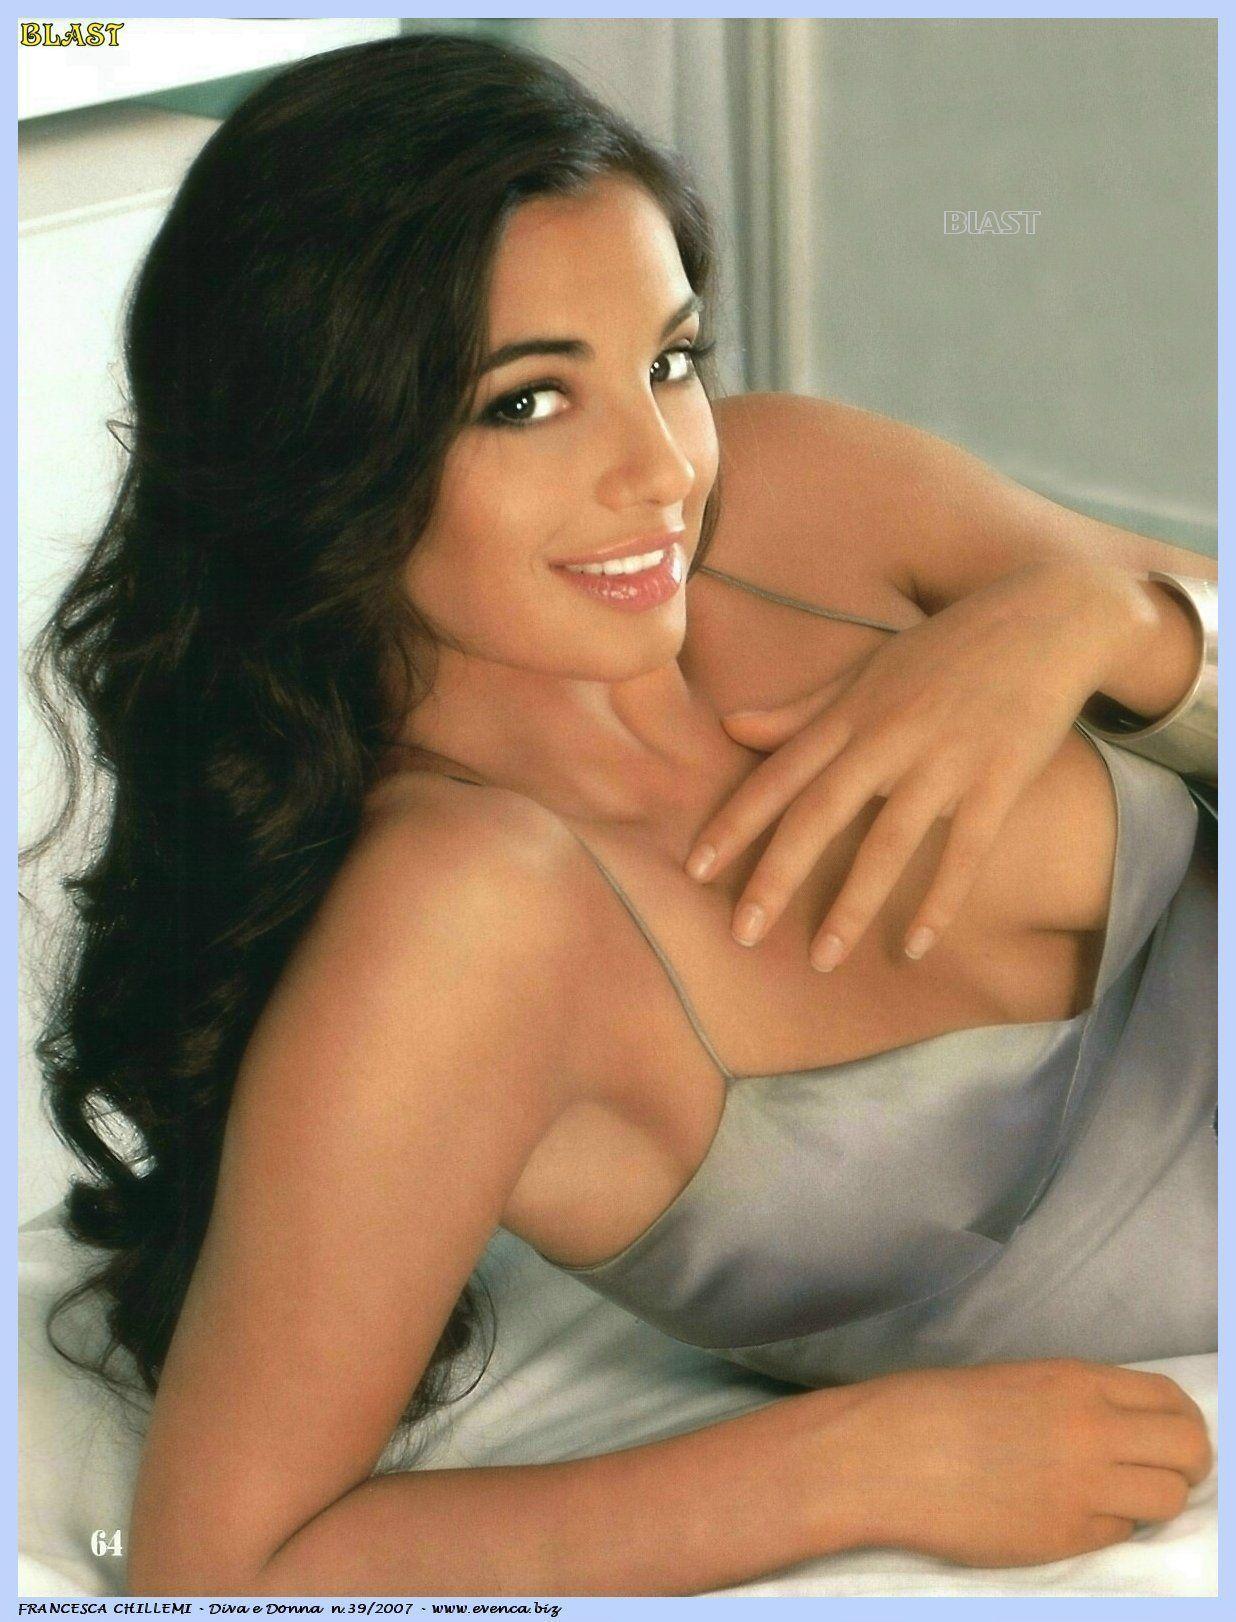 Beautiful erotic women pics